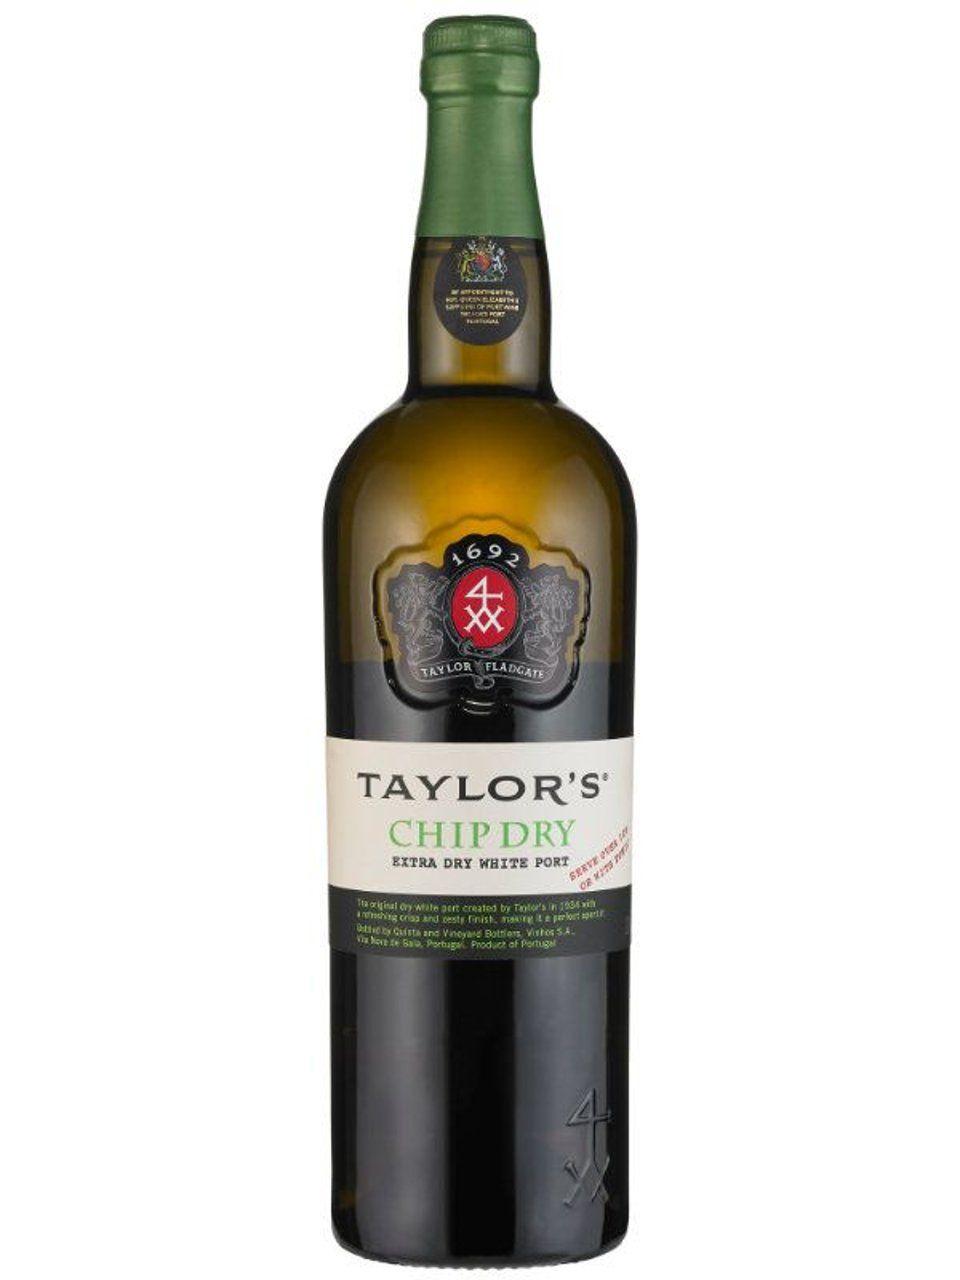 Taylors Chip Dry Port